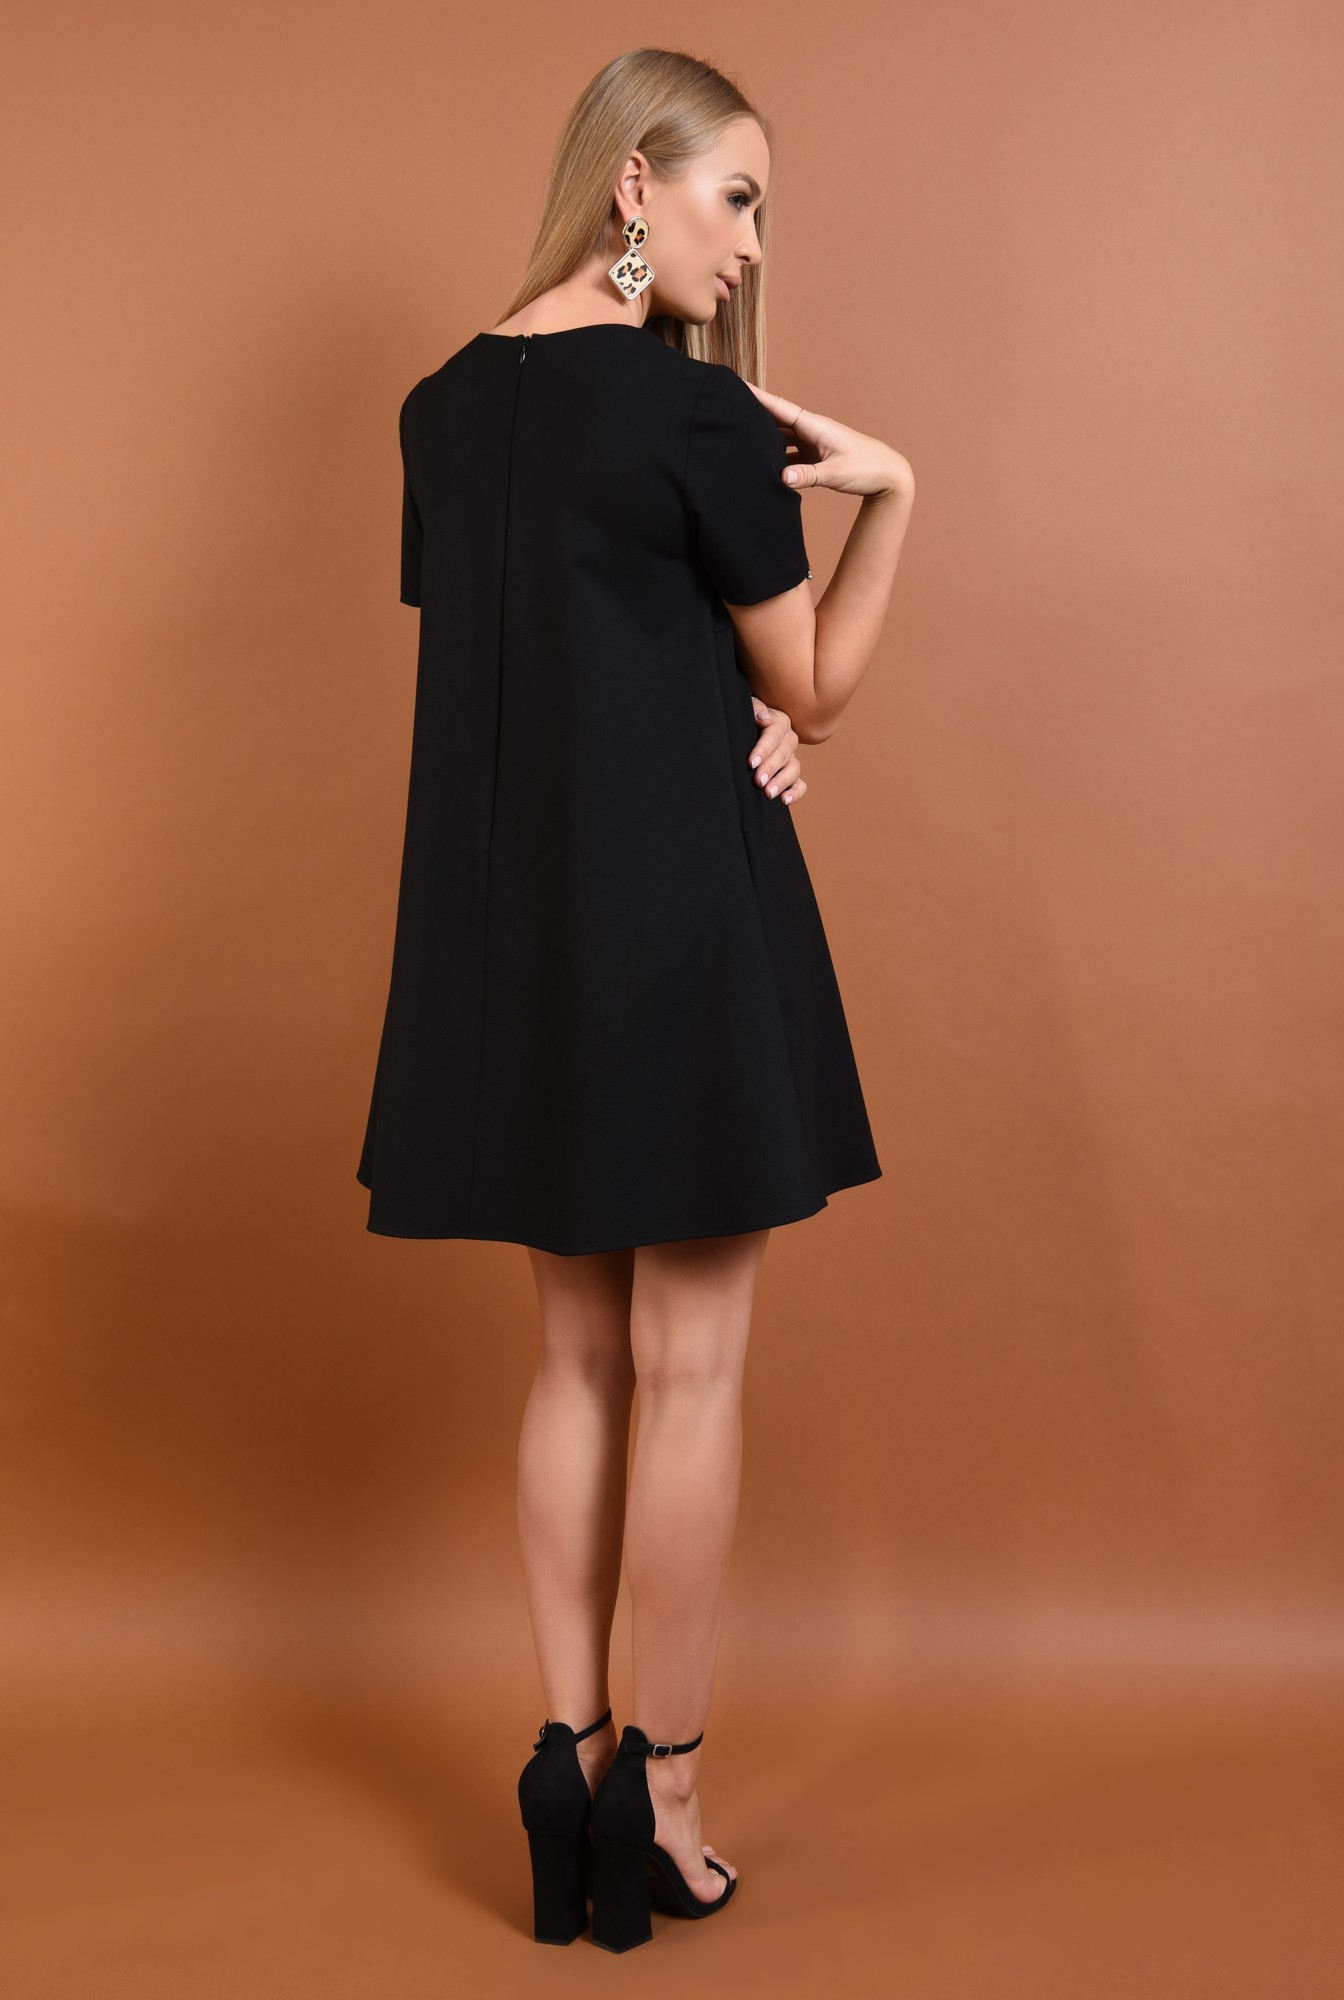 1 - rochie din tricot, neagra, scurta, croi evazat